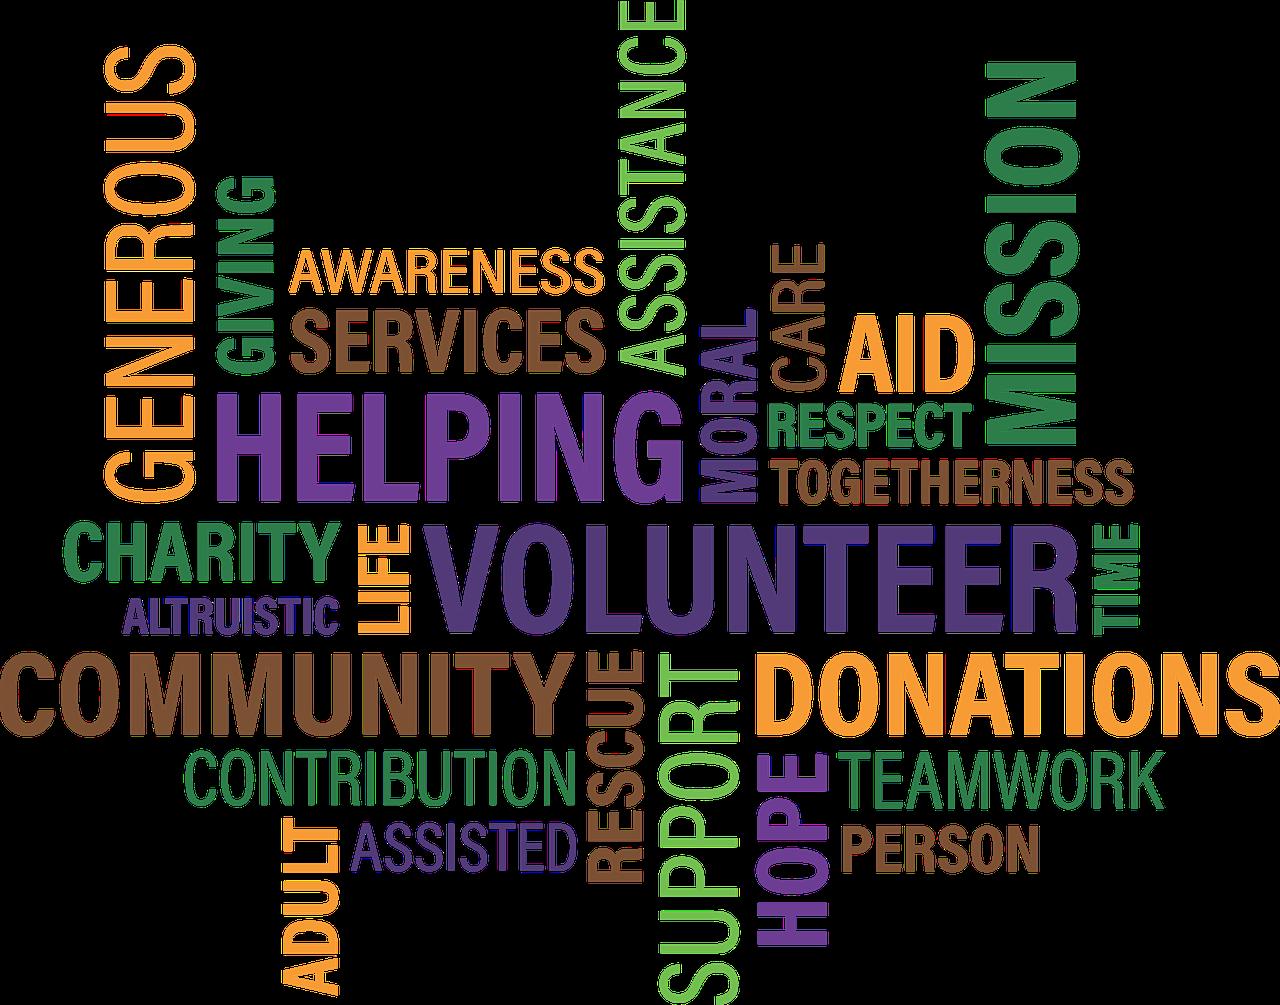 volunteer-1326758_1280-1_maialisa